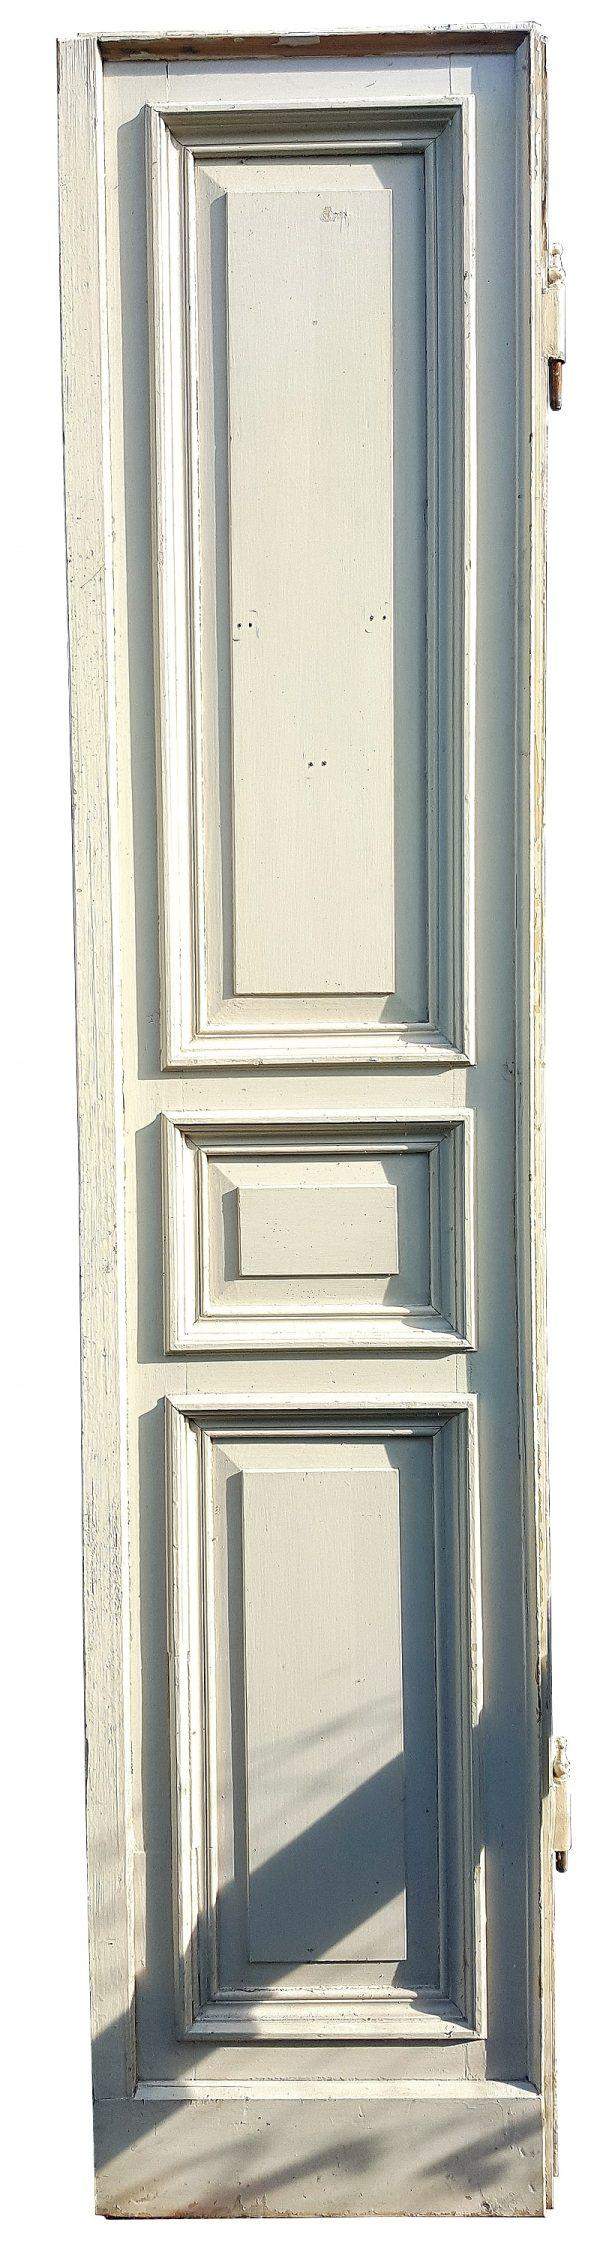 Alte Tür Holztür für Deko shabby vintage Upcycling